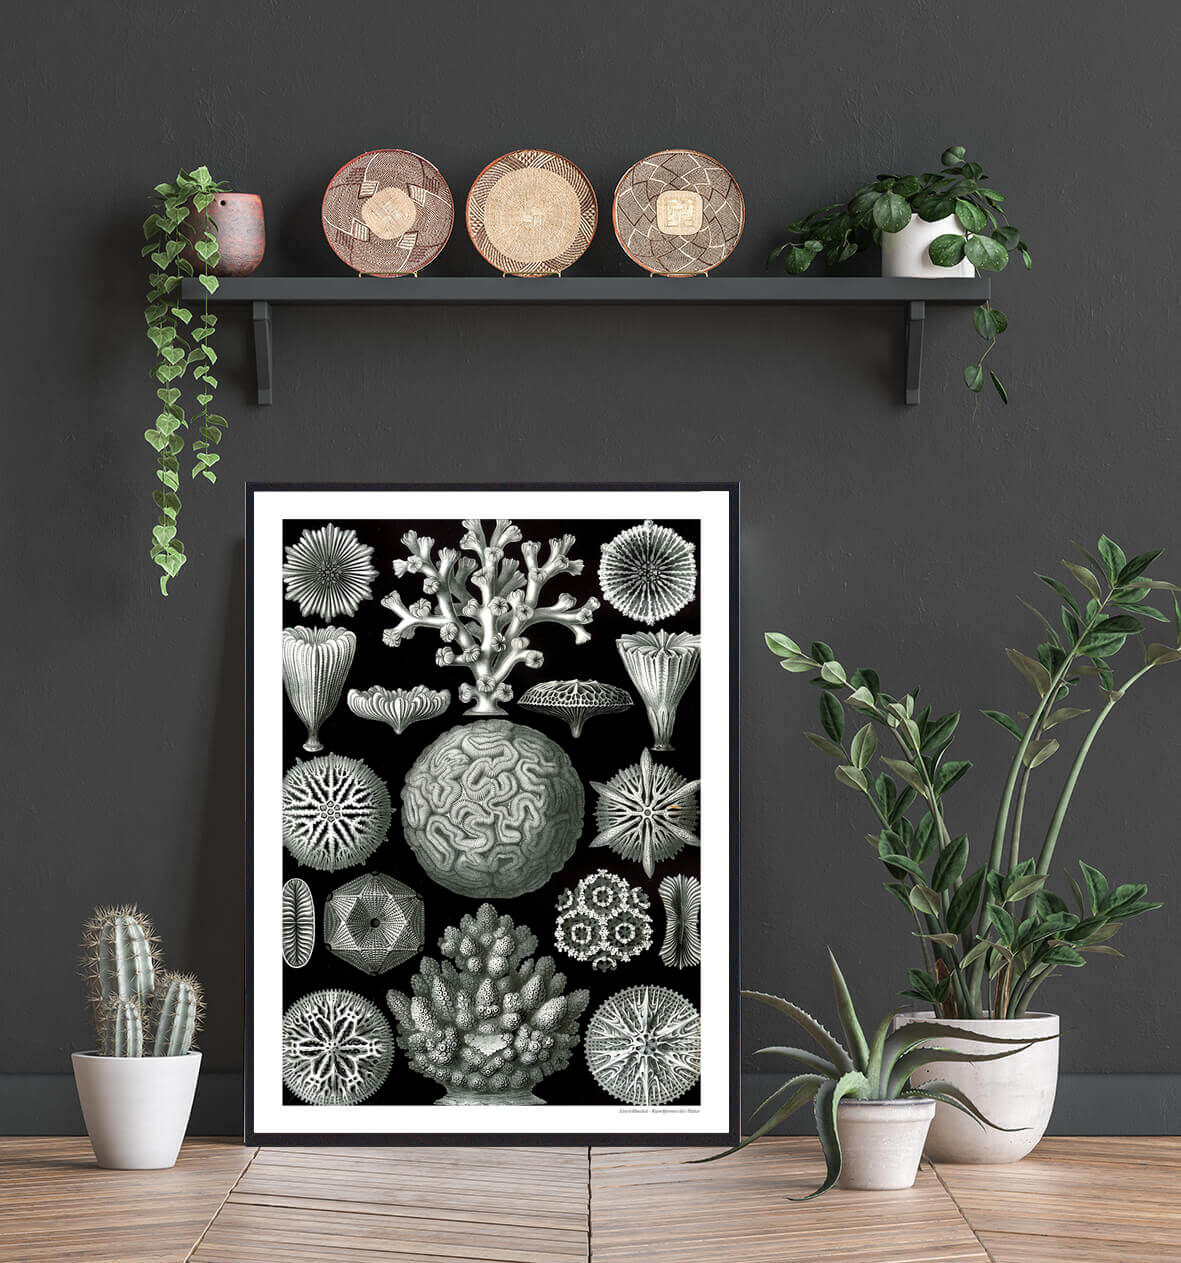 mangearmede-koraldyr-plakat-2